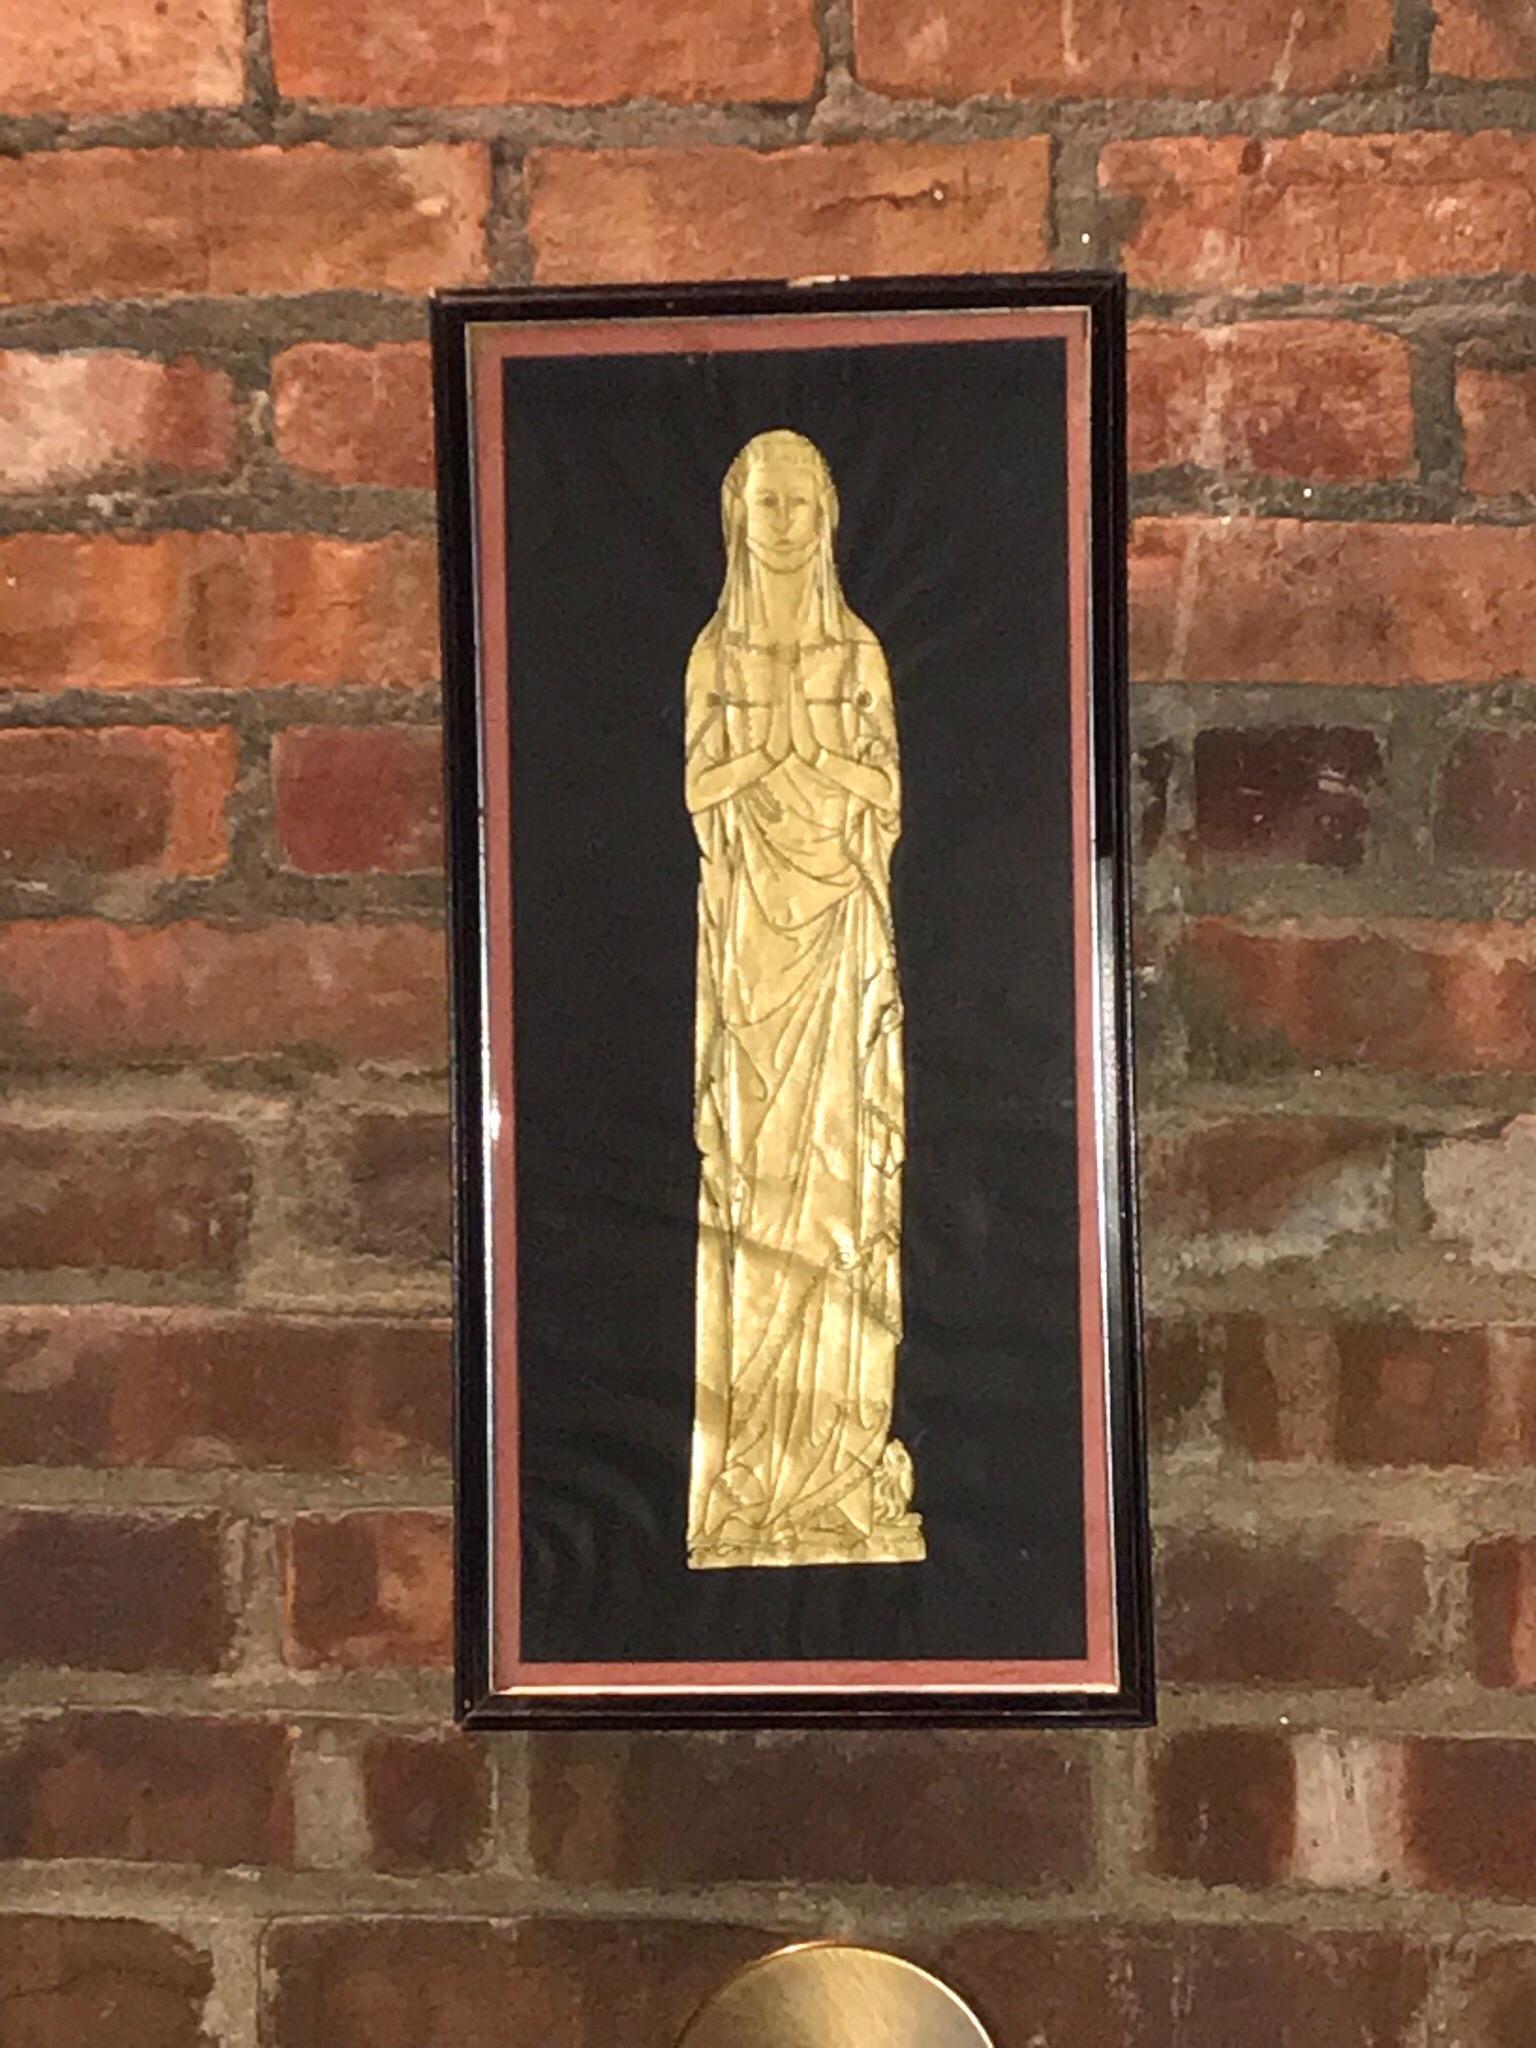 Framed golden figure painting $60